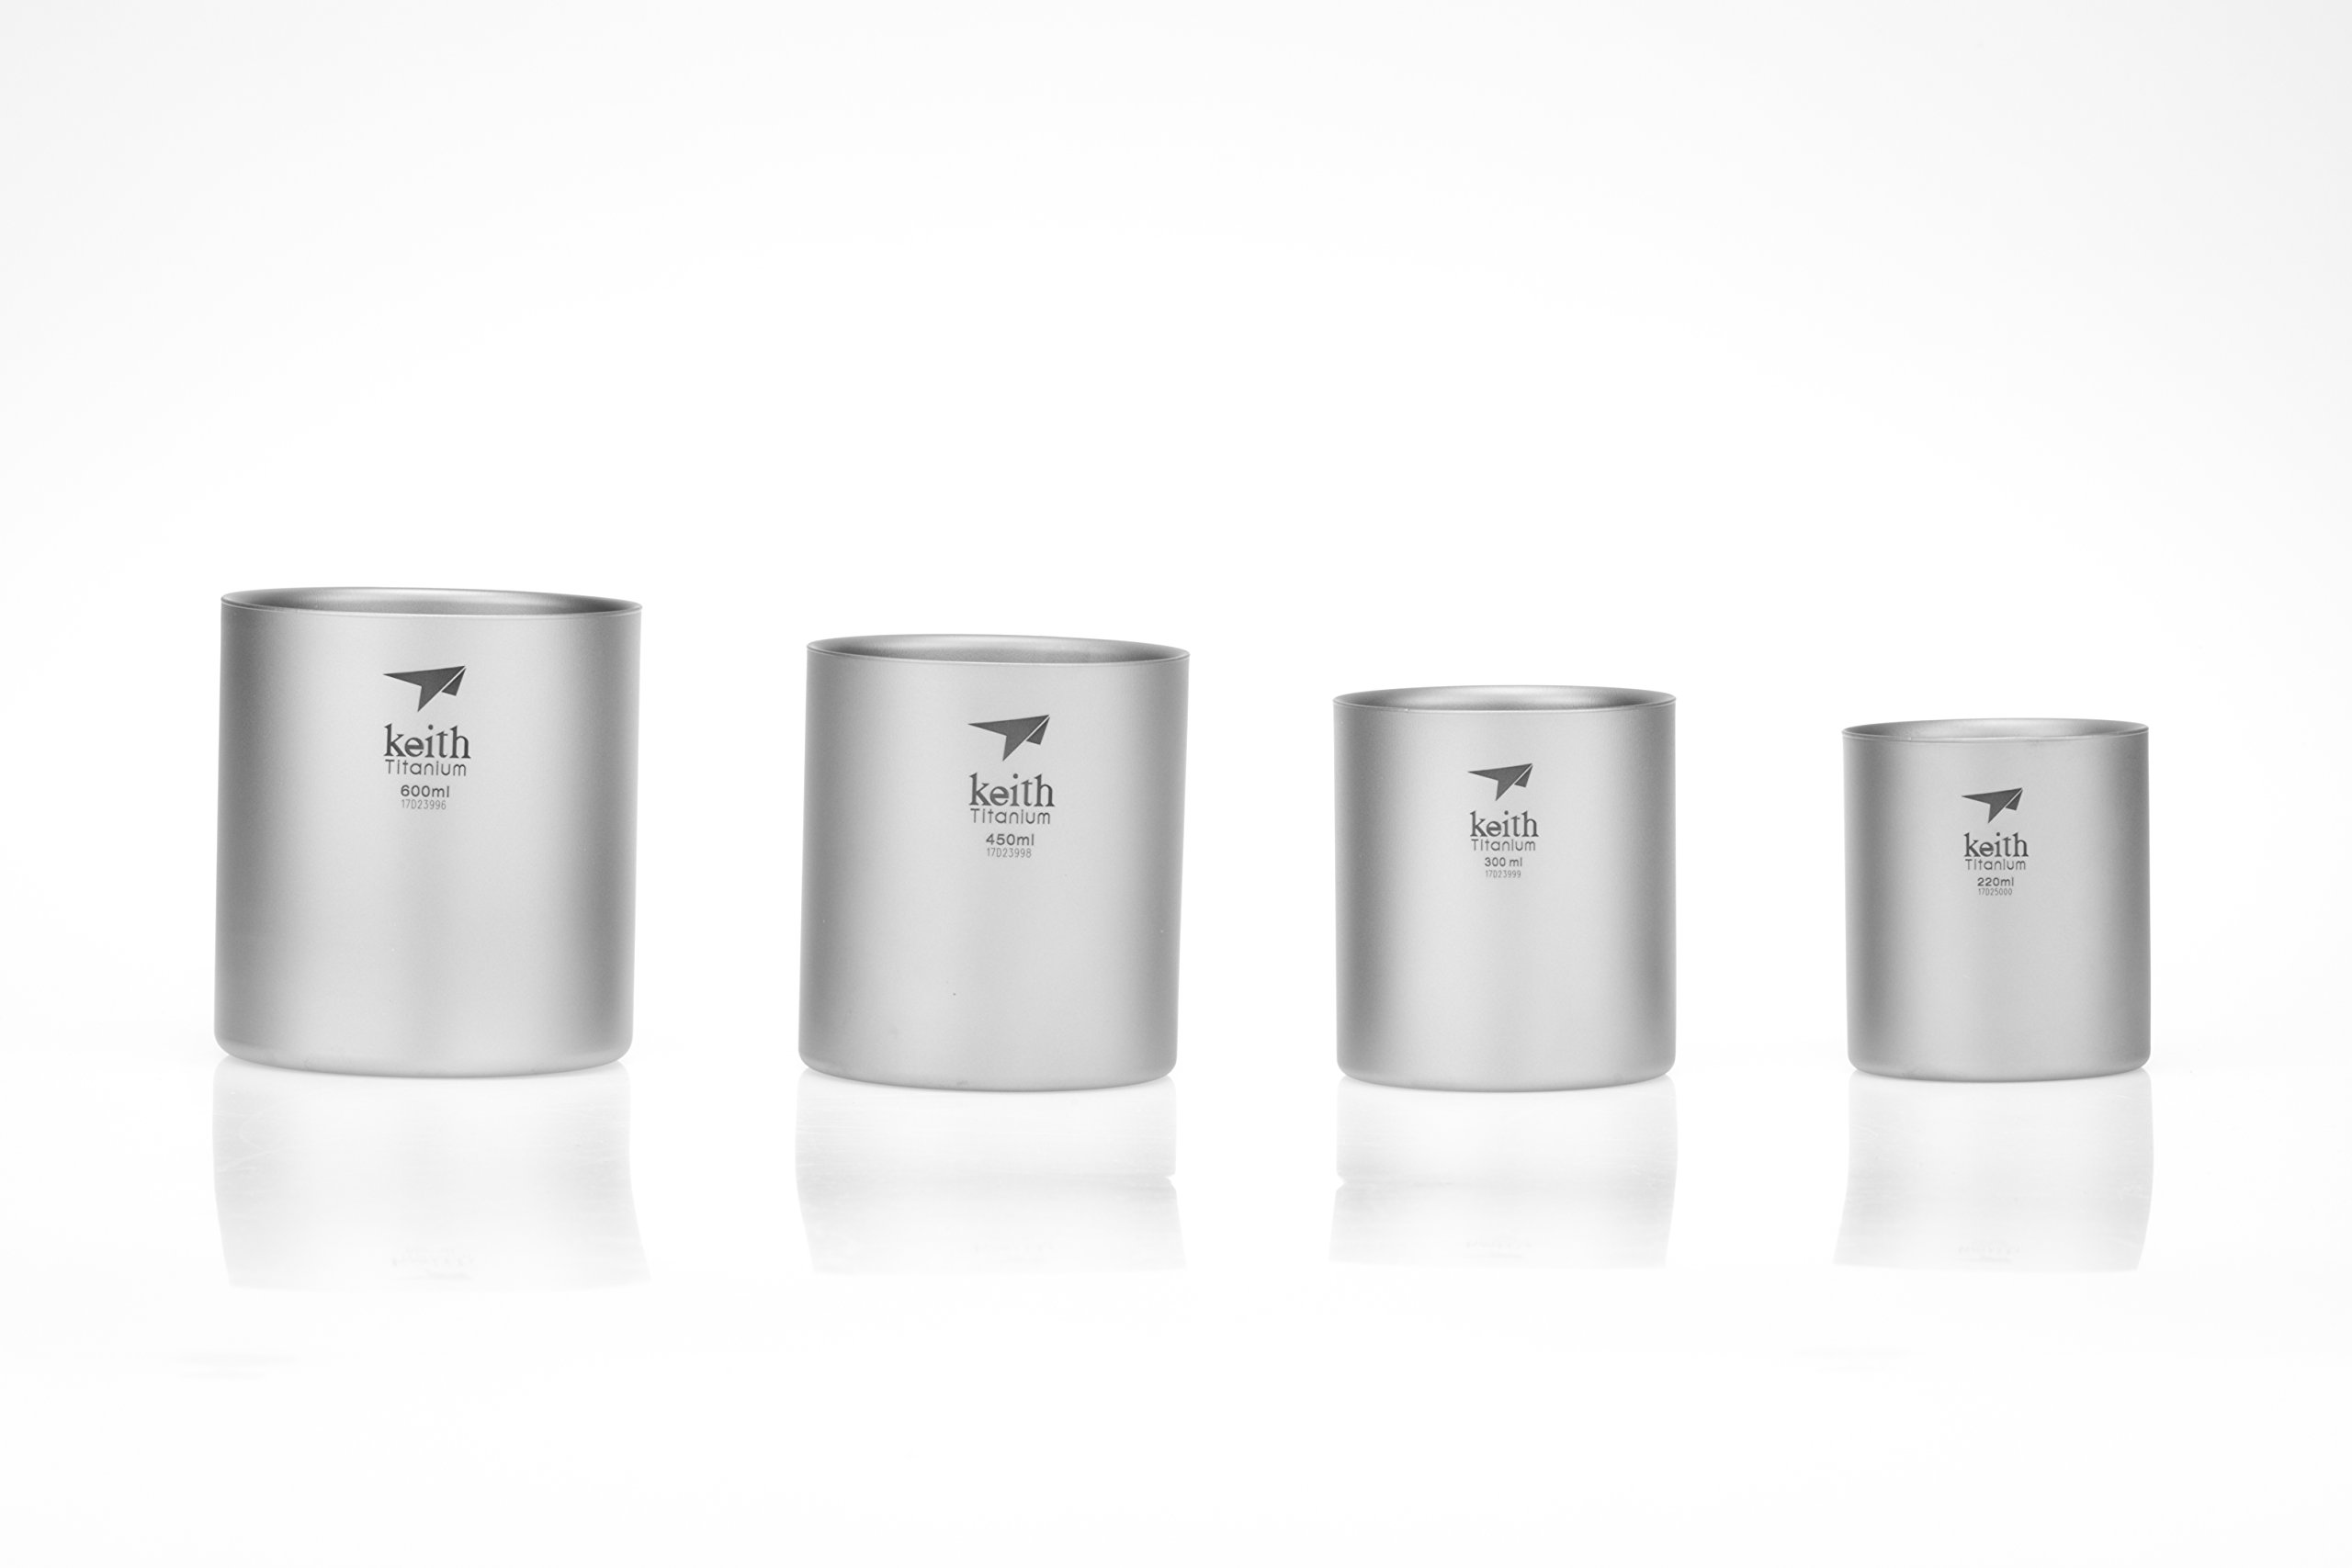 Keith Titanium Ti3501 Nesting 4-Piece Double-Wall Mug Set